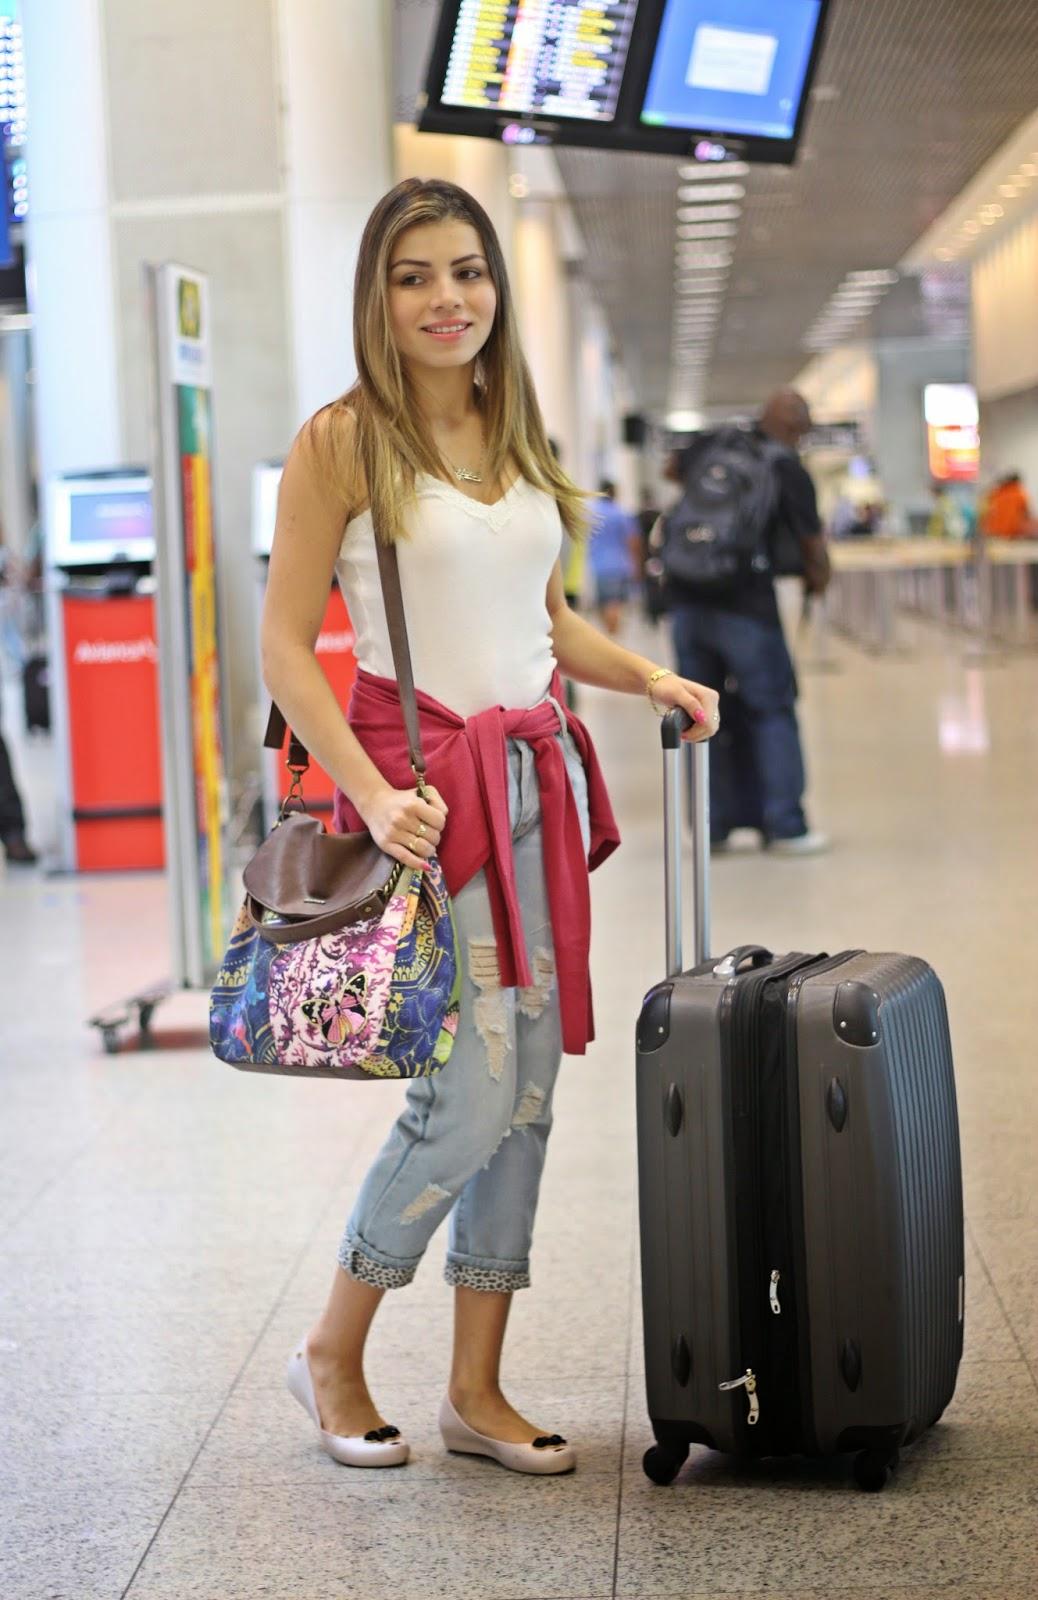 Aeroporto A Capri : By paloma soaresㅤㅤㅤㅤㅤㅤㅤㅤ look aeroporto santos dumont